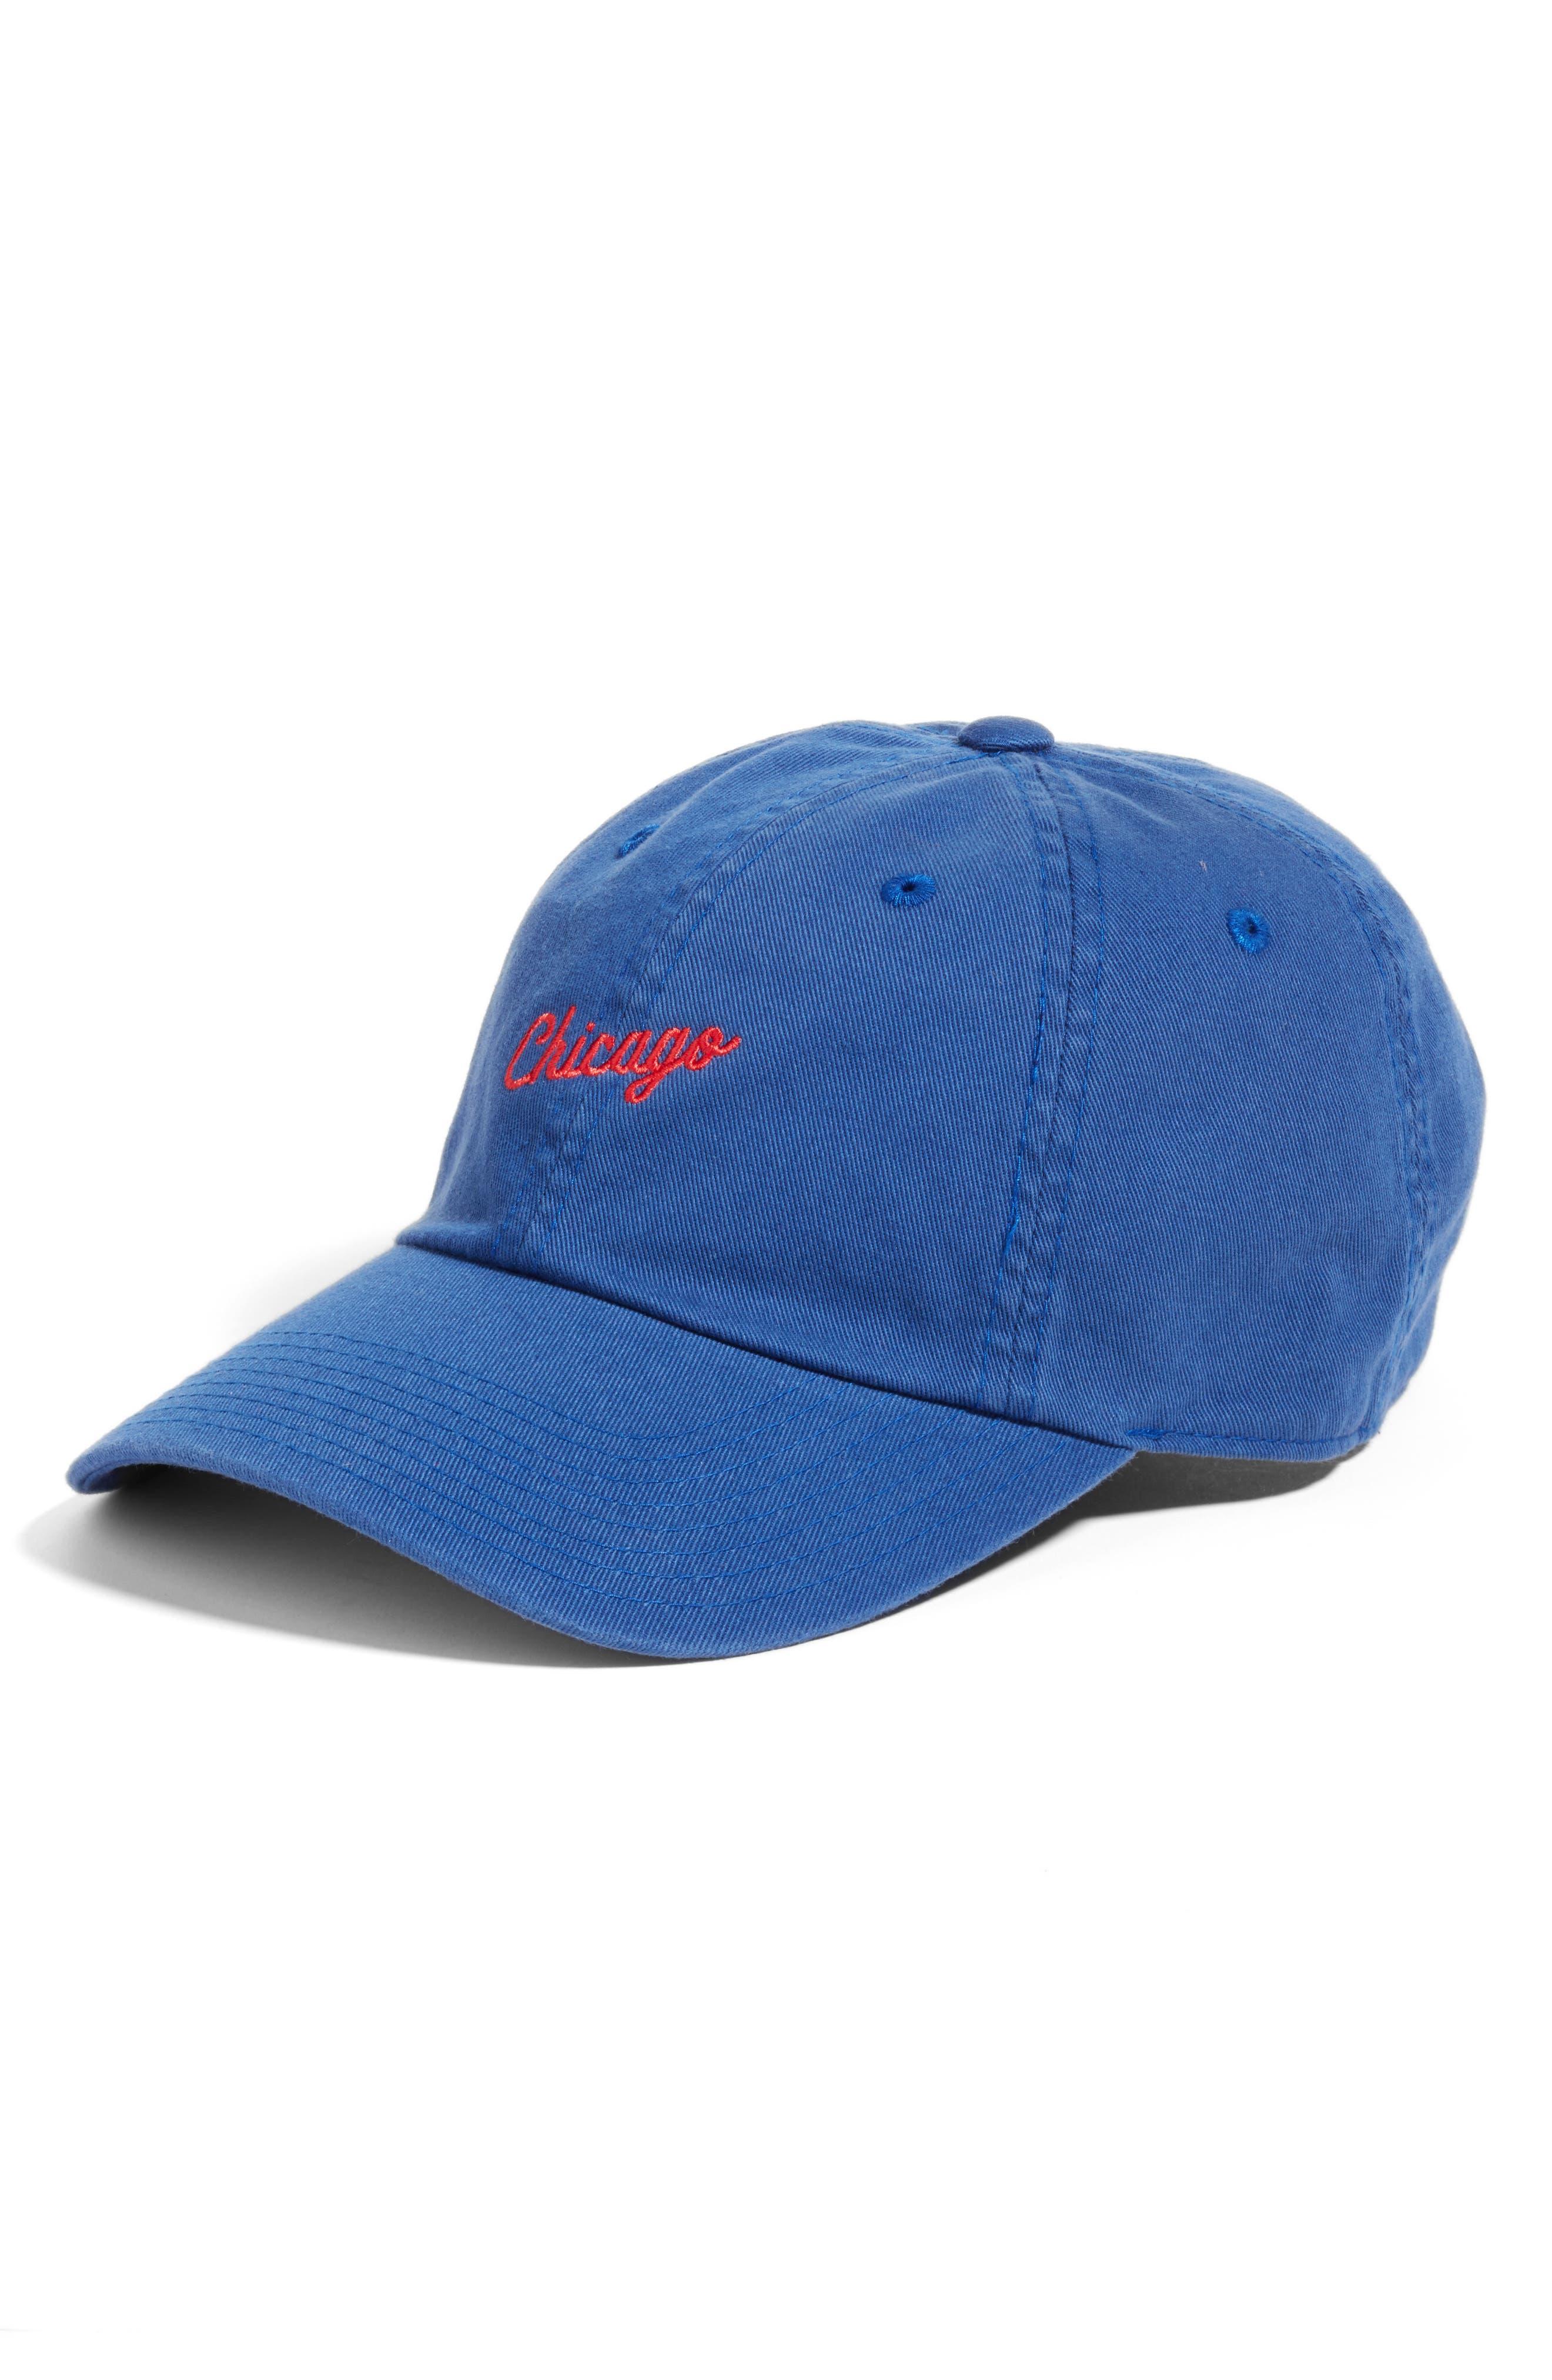 American Needle Boardshort - Chicago Baseball Cap